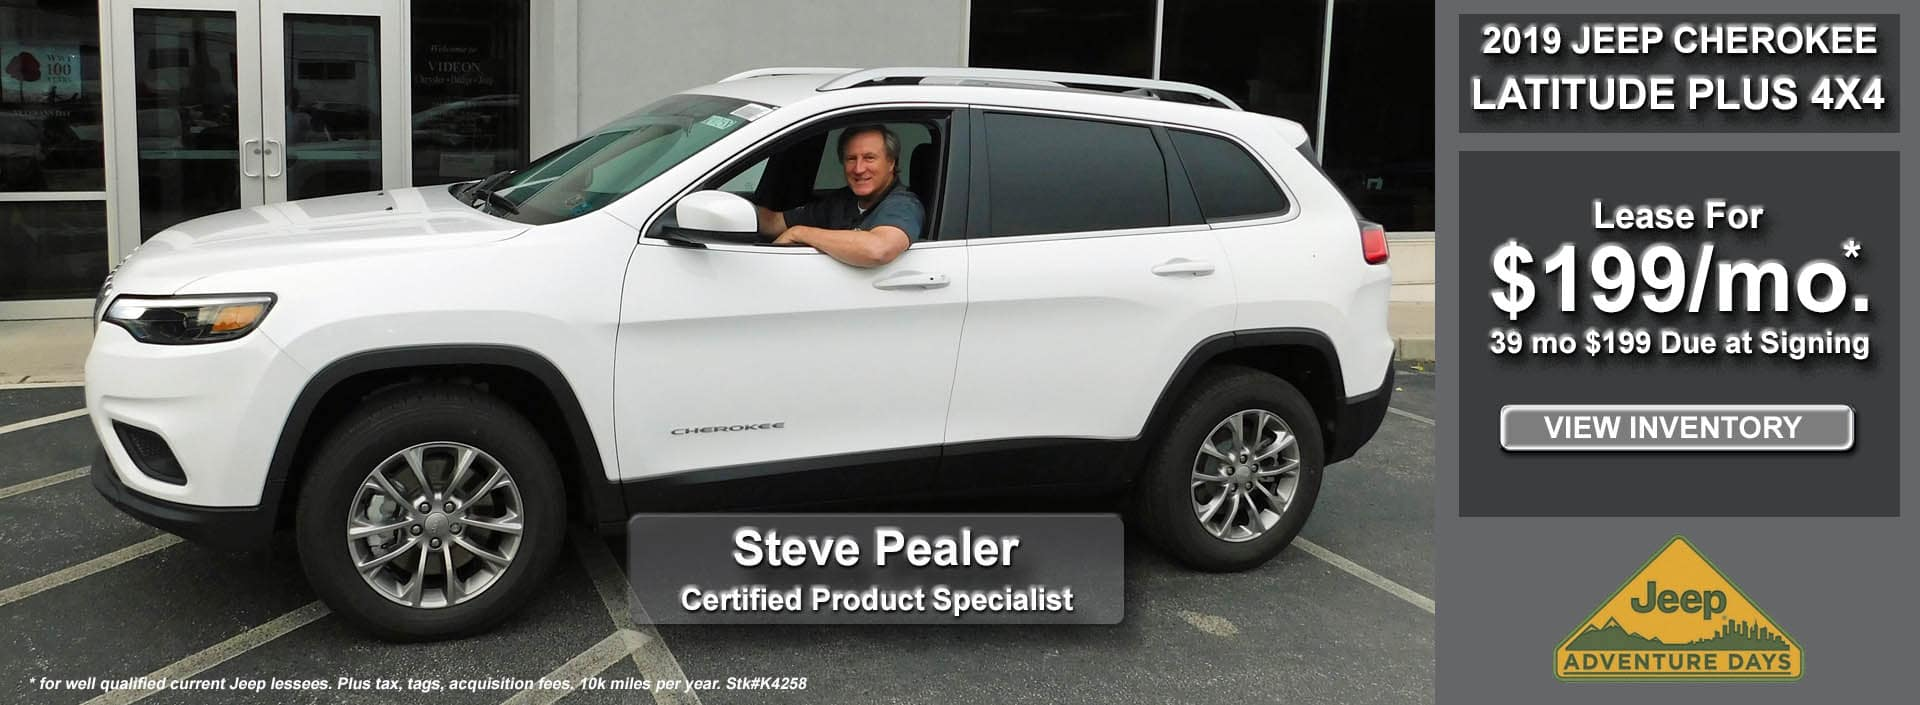 Welcome To Videon. Chrysler Dodge Jeep RAM